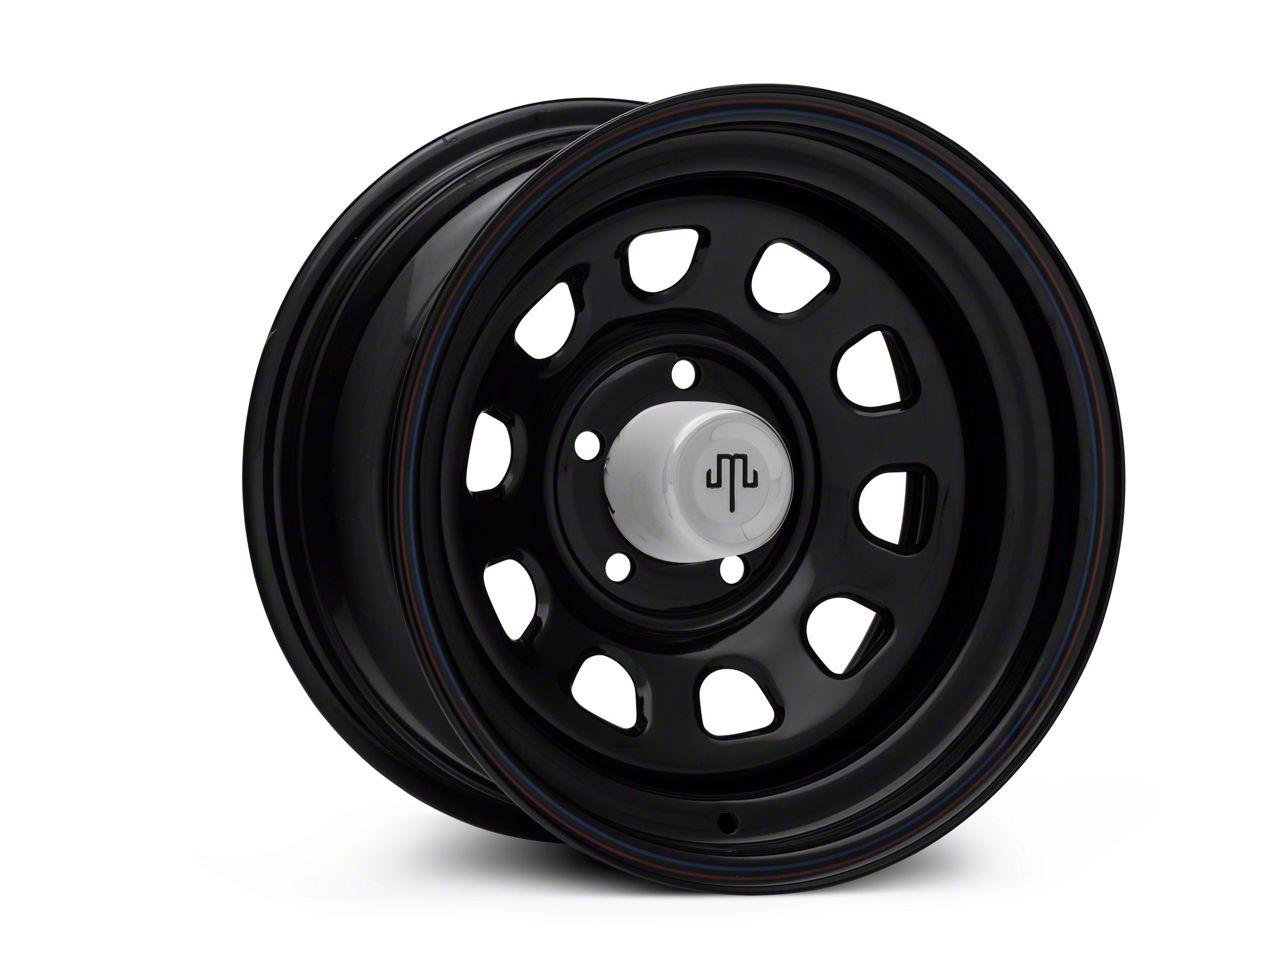 Mammoth D Window Black Wagon Wheel Edition Steel Wheel 15x8 Wheel & Mickey Thompson Deegan 38 31x10.50R15 Tire Kit (87-06 Jeep Wrangler YJ & TJ)